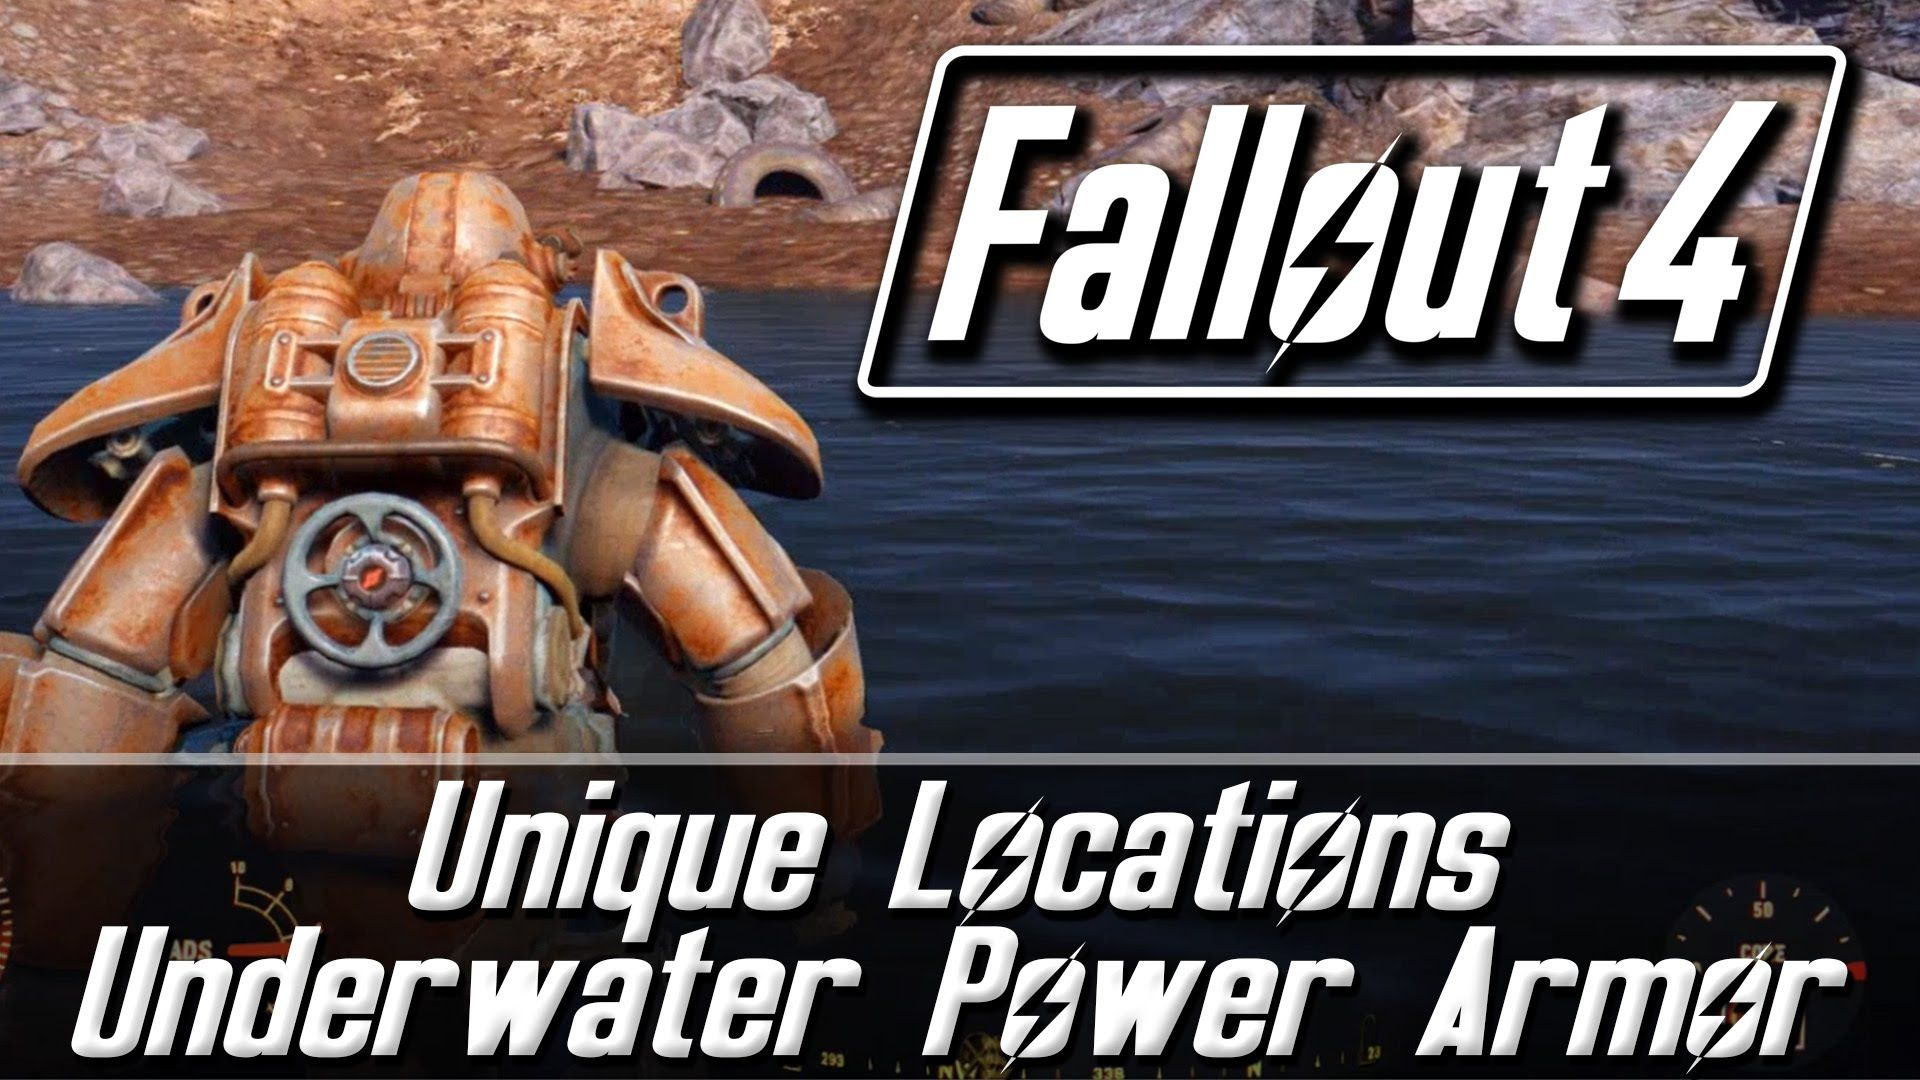 Fallout 4 Unique Locations Underwater Power Armor Revered Legend Fallout 4 Secrets Fallout Fallout 4 Power Armor